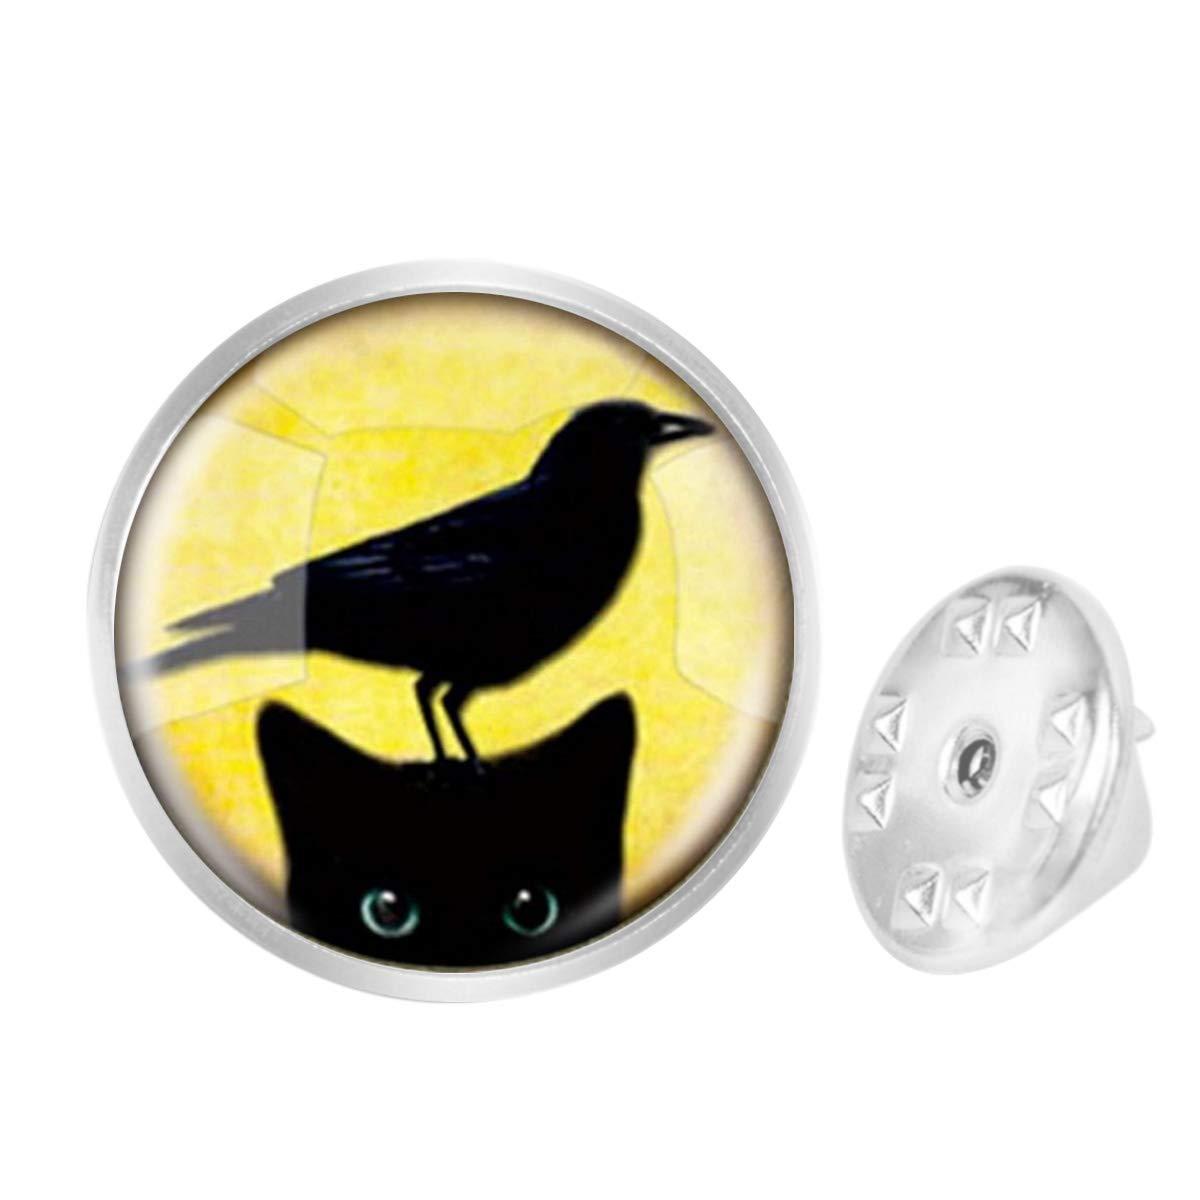 WAZZIT Round Metal Tie Tack Hat Lapel Pin Brooches Black Cat Bird Banquet Badge Enamel Pins Trendy Accessory Jacket T-Shirt